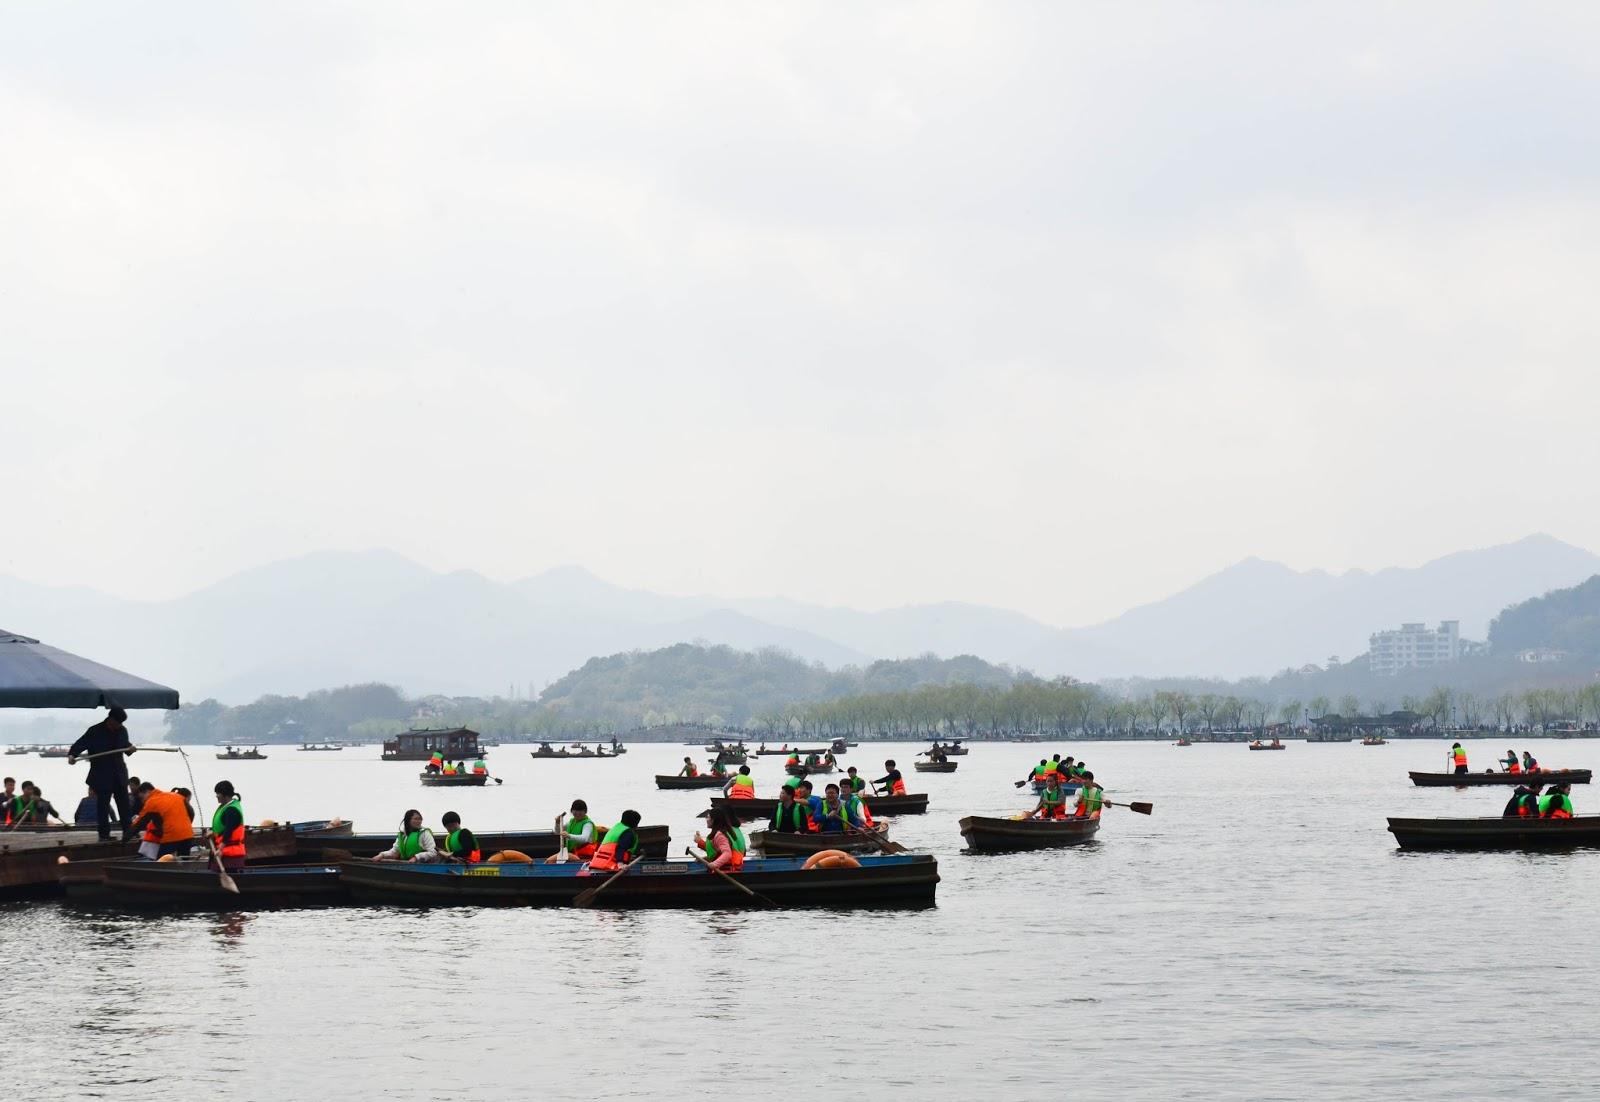 boats on the lake of hangzhou